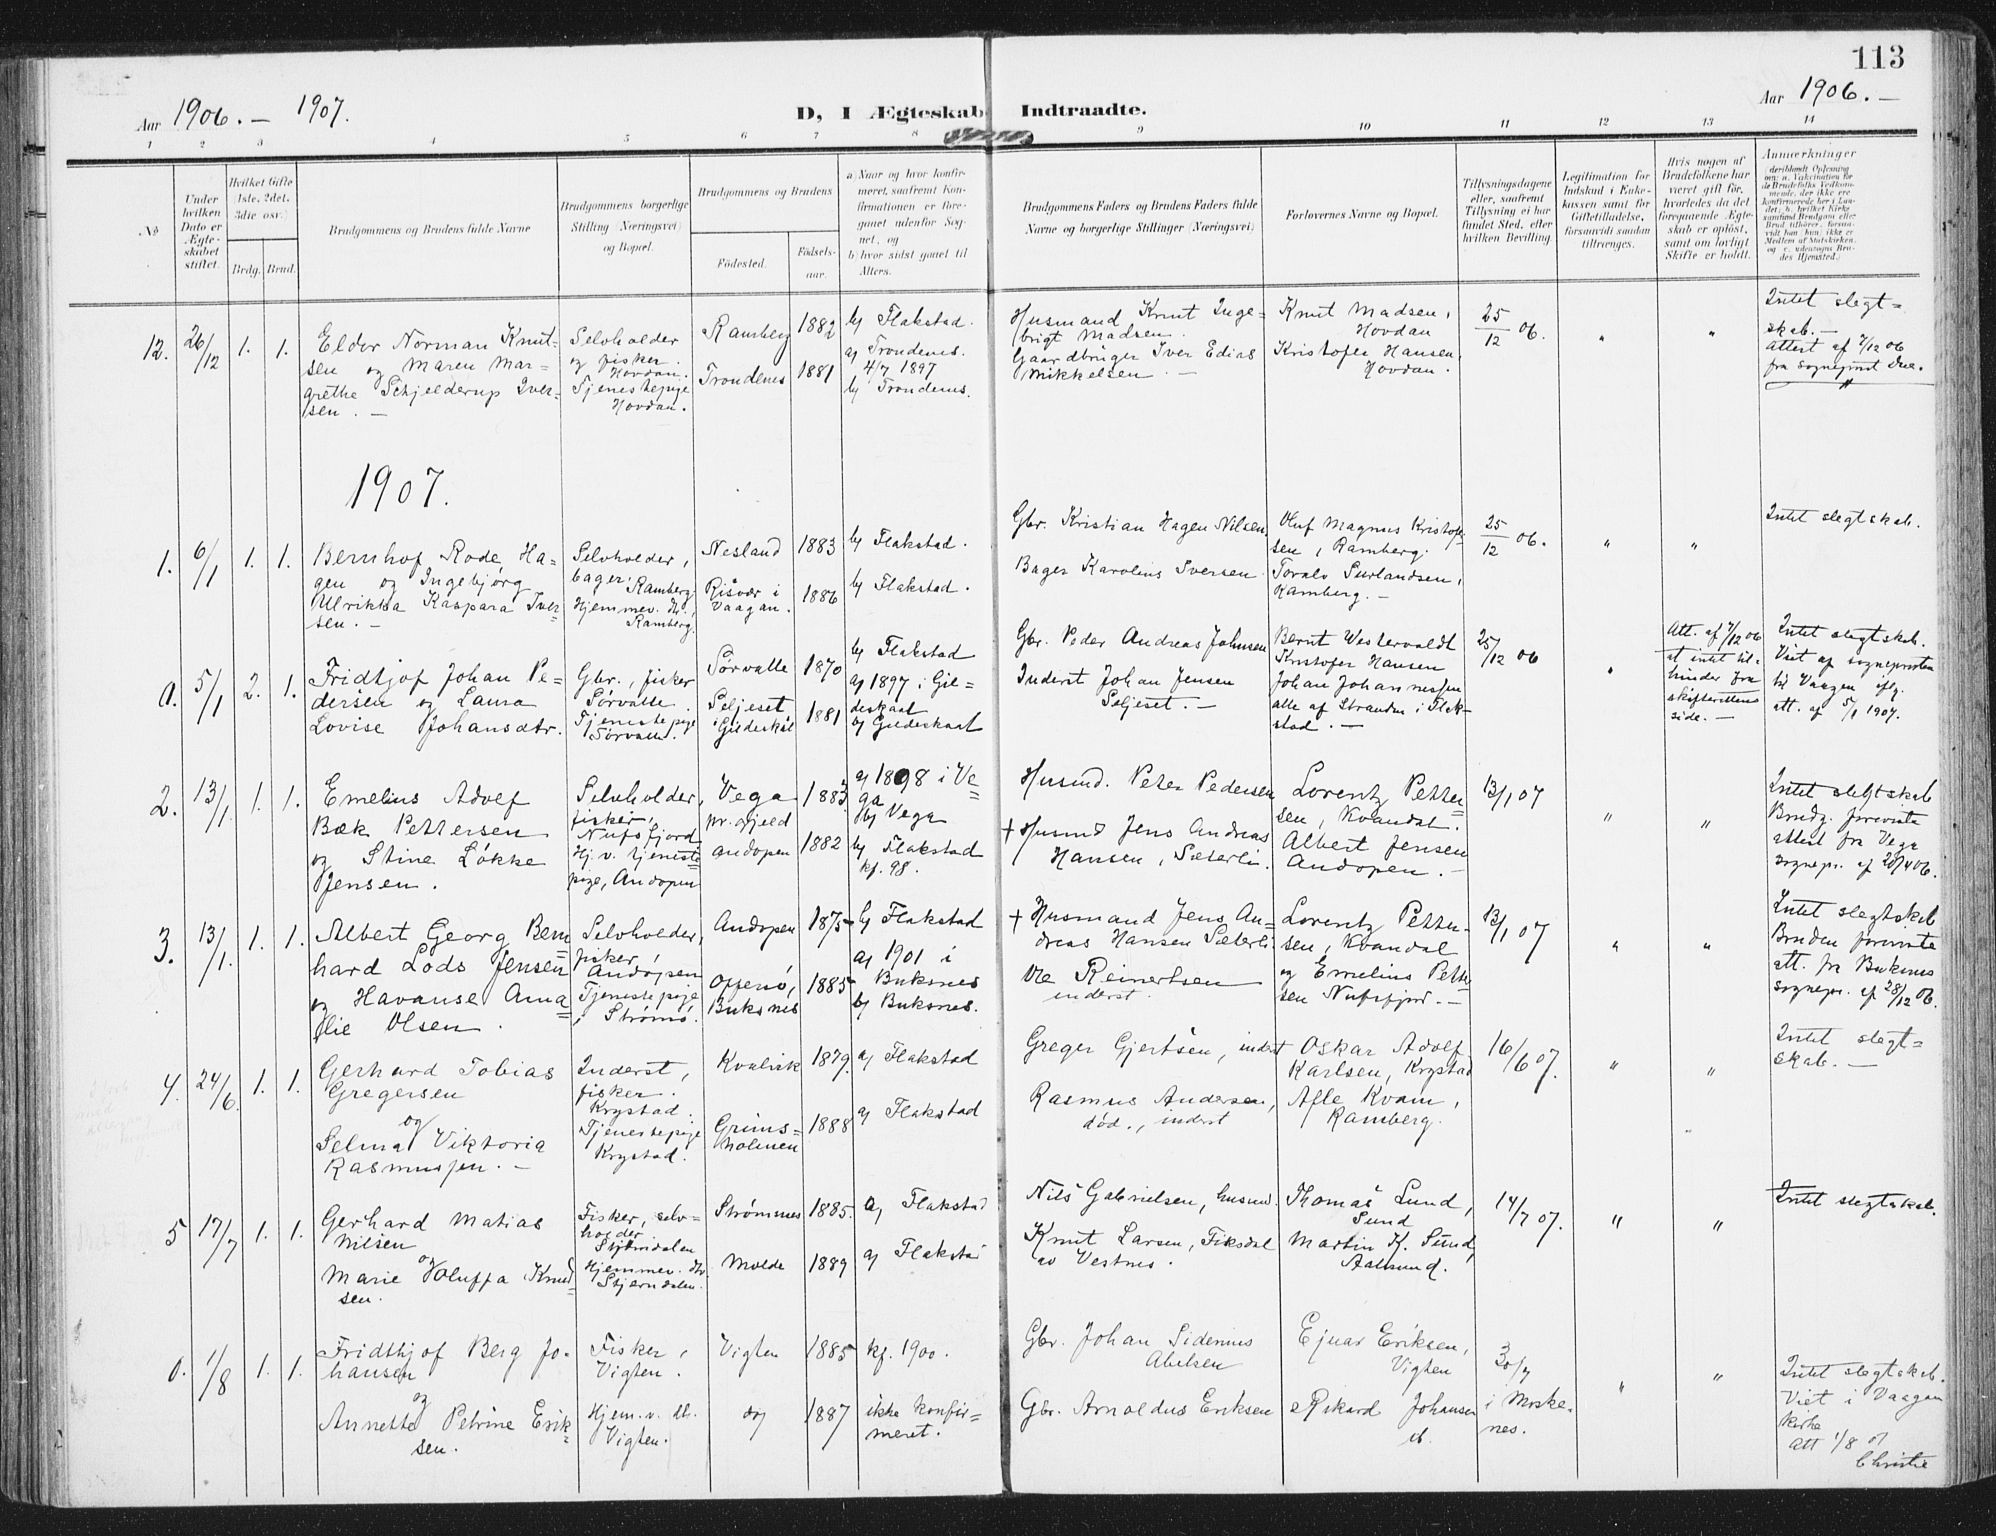 SAT, Ministerialprotokoller, klokkerbøker og fødselsregistre - Nordland, 885/L1206: Ministerialbok nr. 885A07, 1905-1915, s. 113